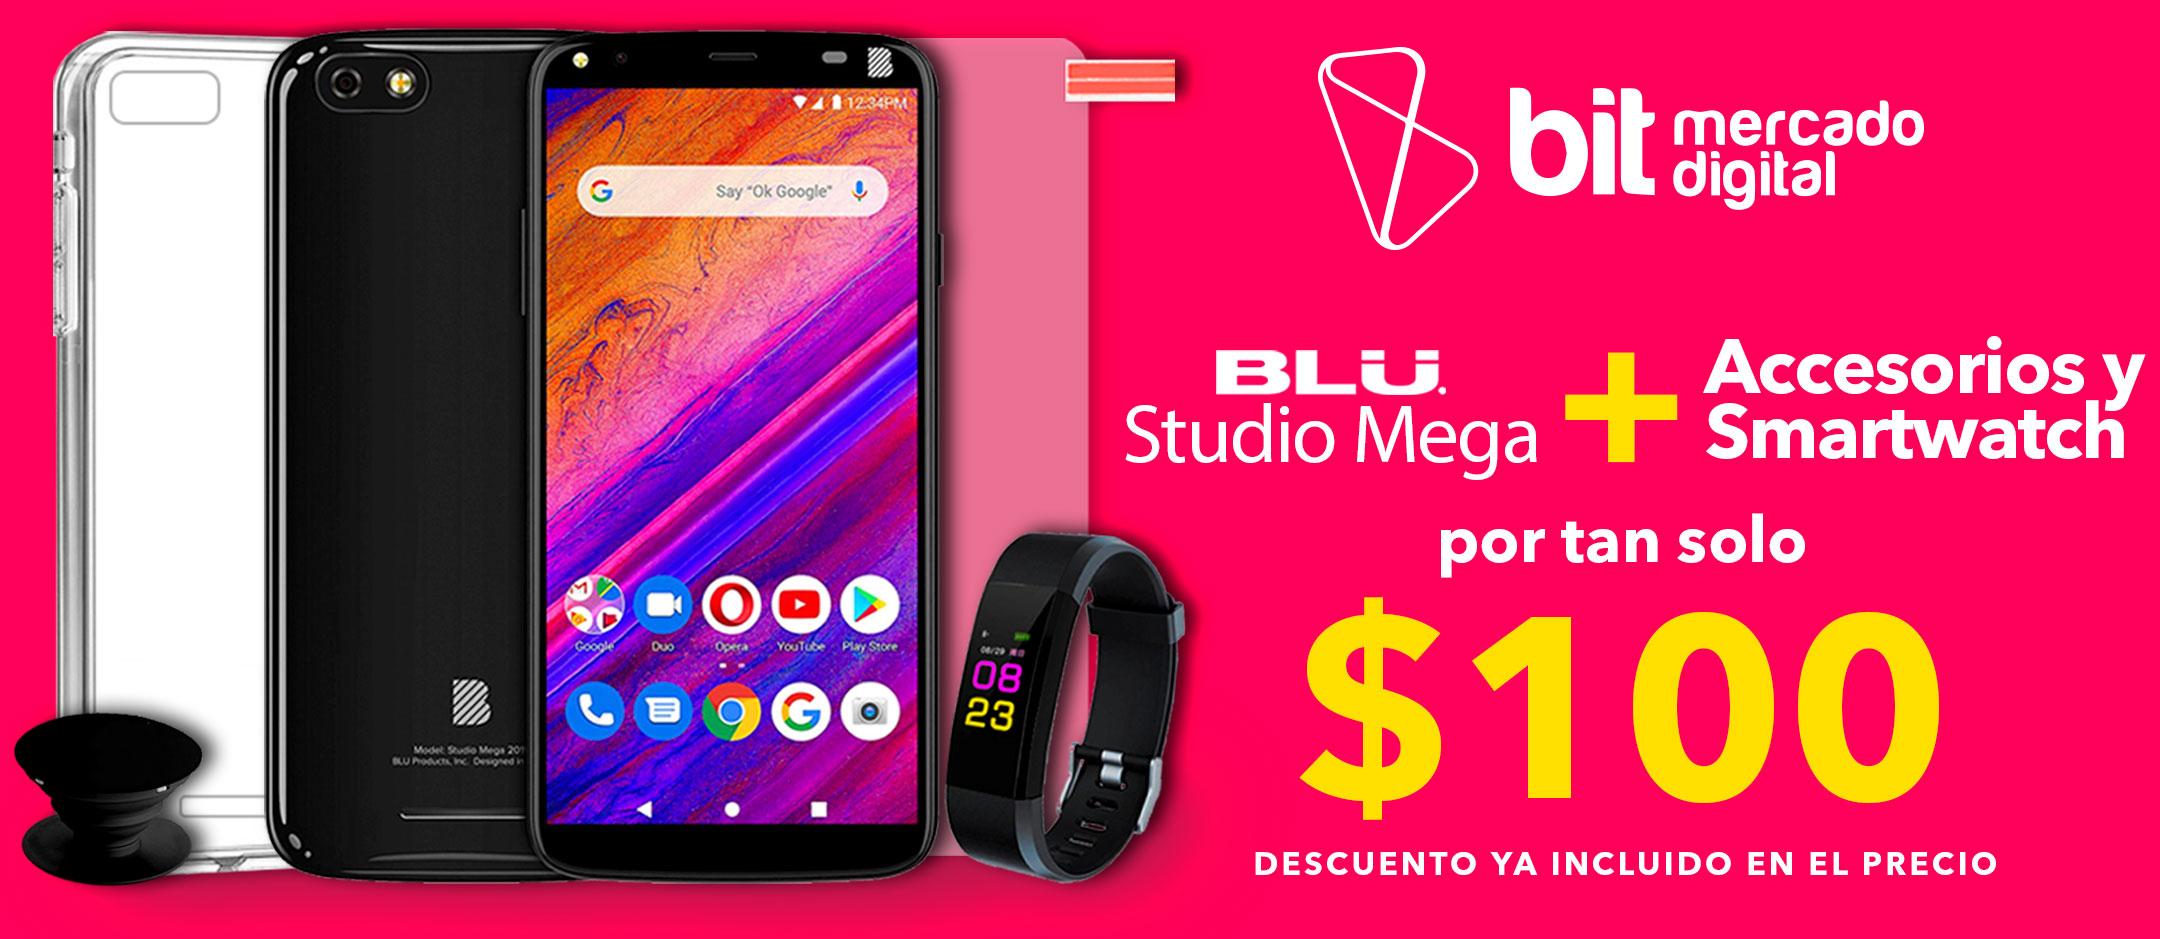 Promo - Bit Mercado Digital